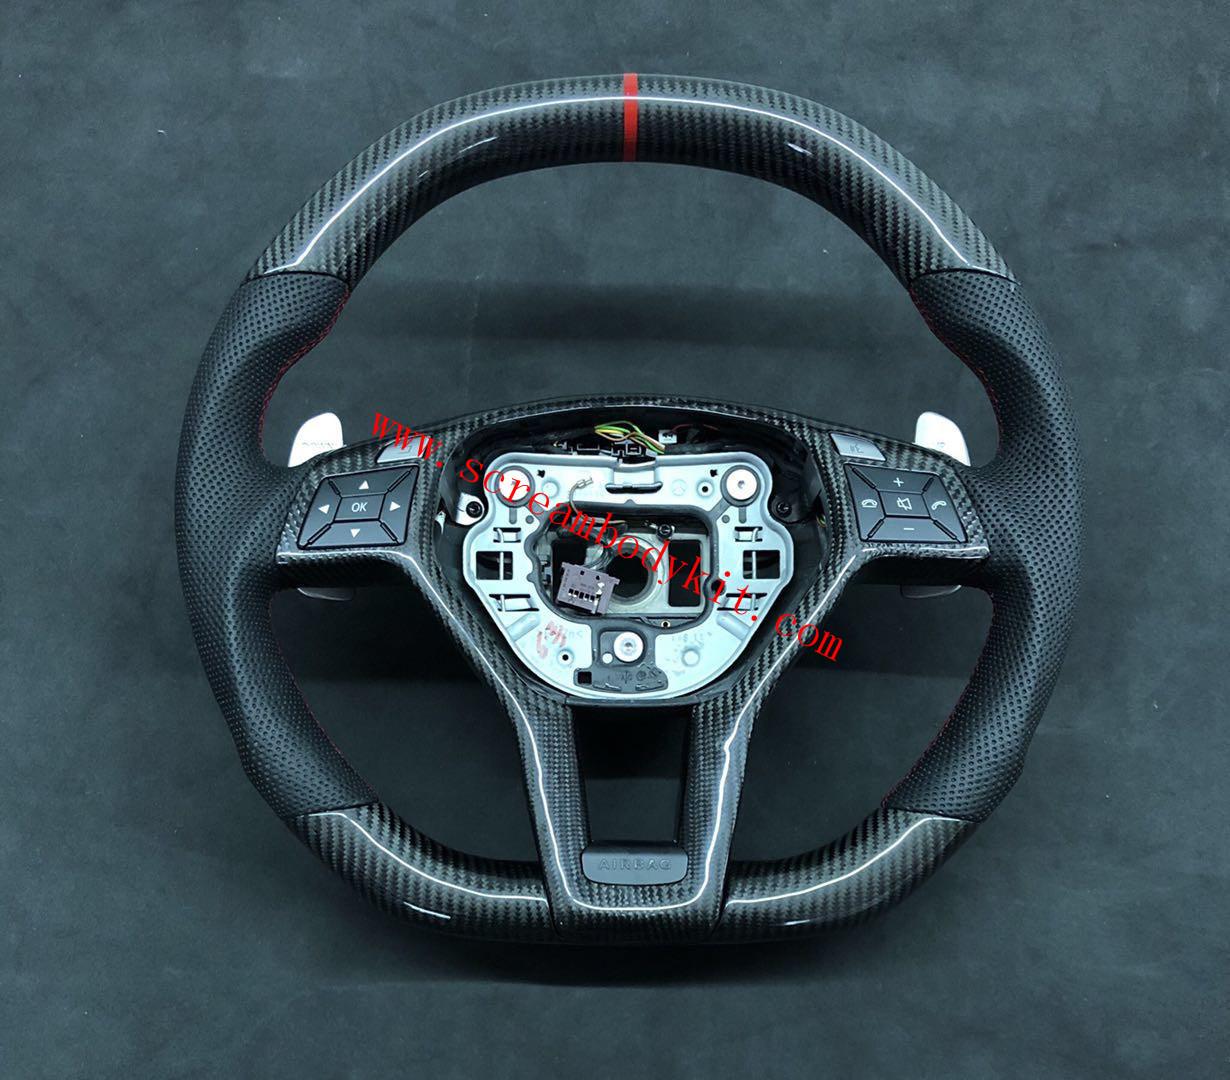 Mercedes-Benz W204 C63 AMG carbon fiber Steering wheel